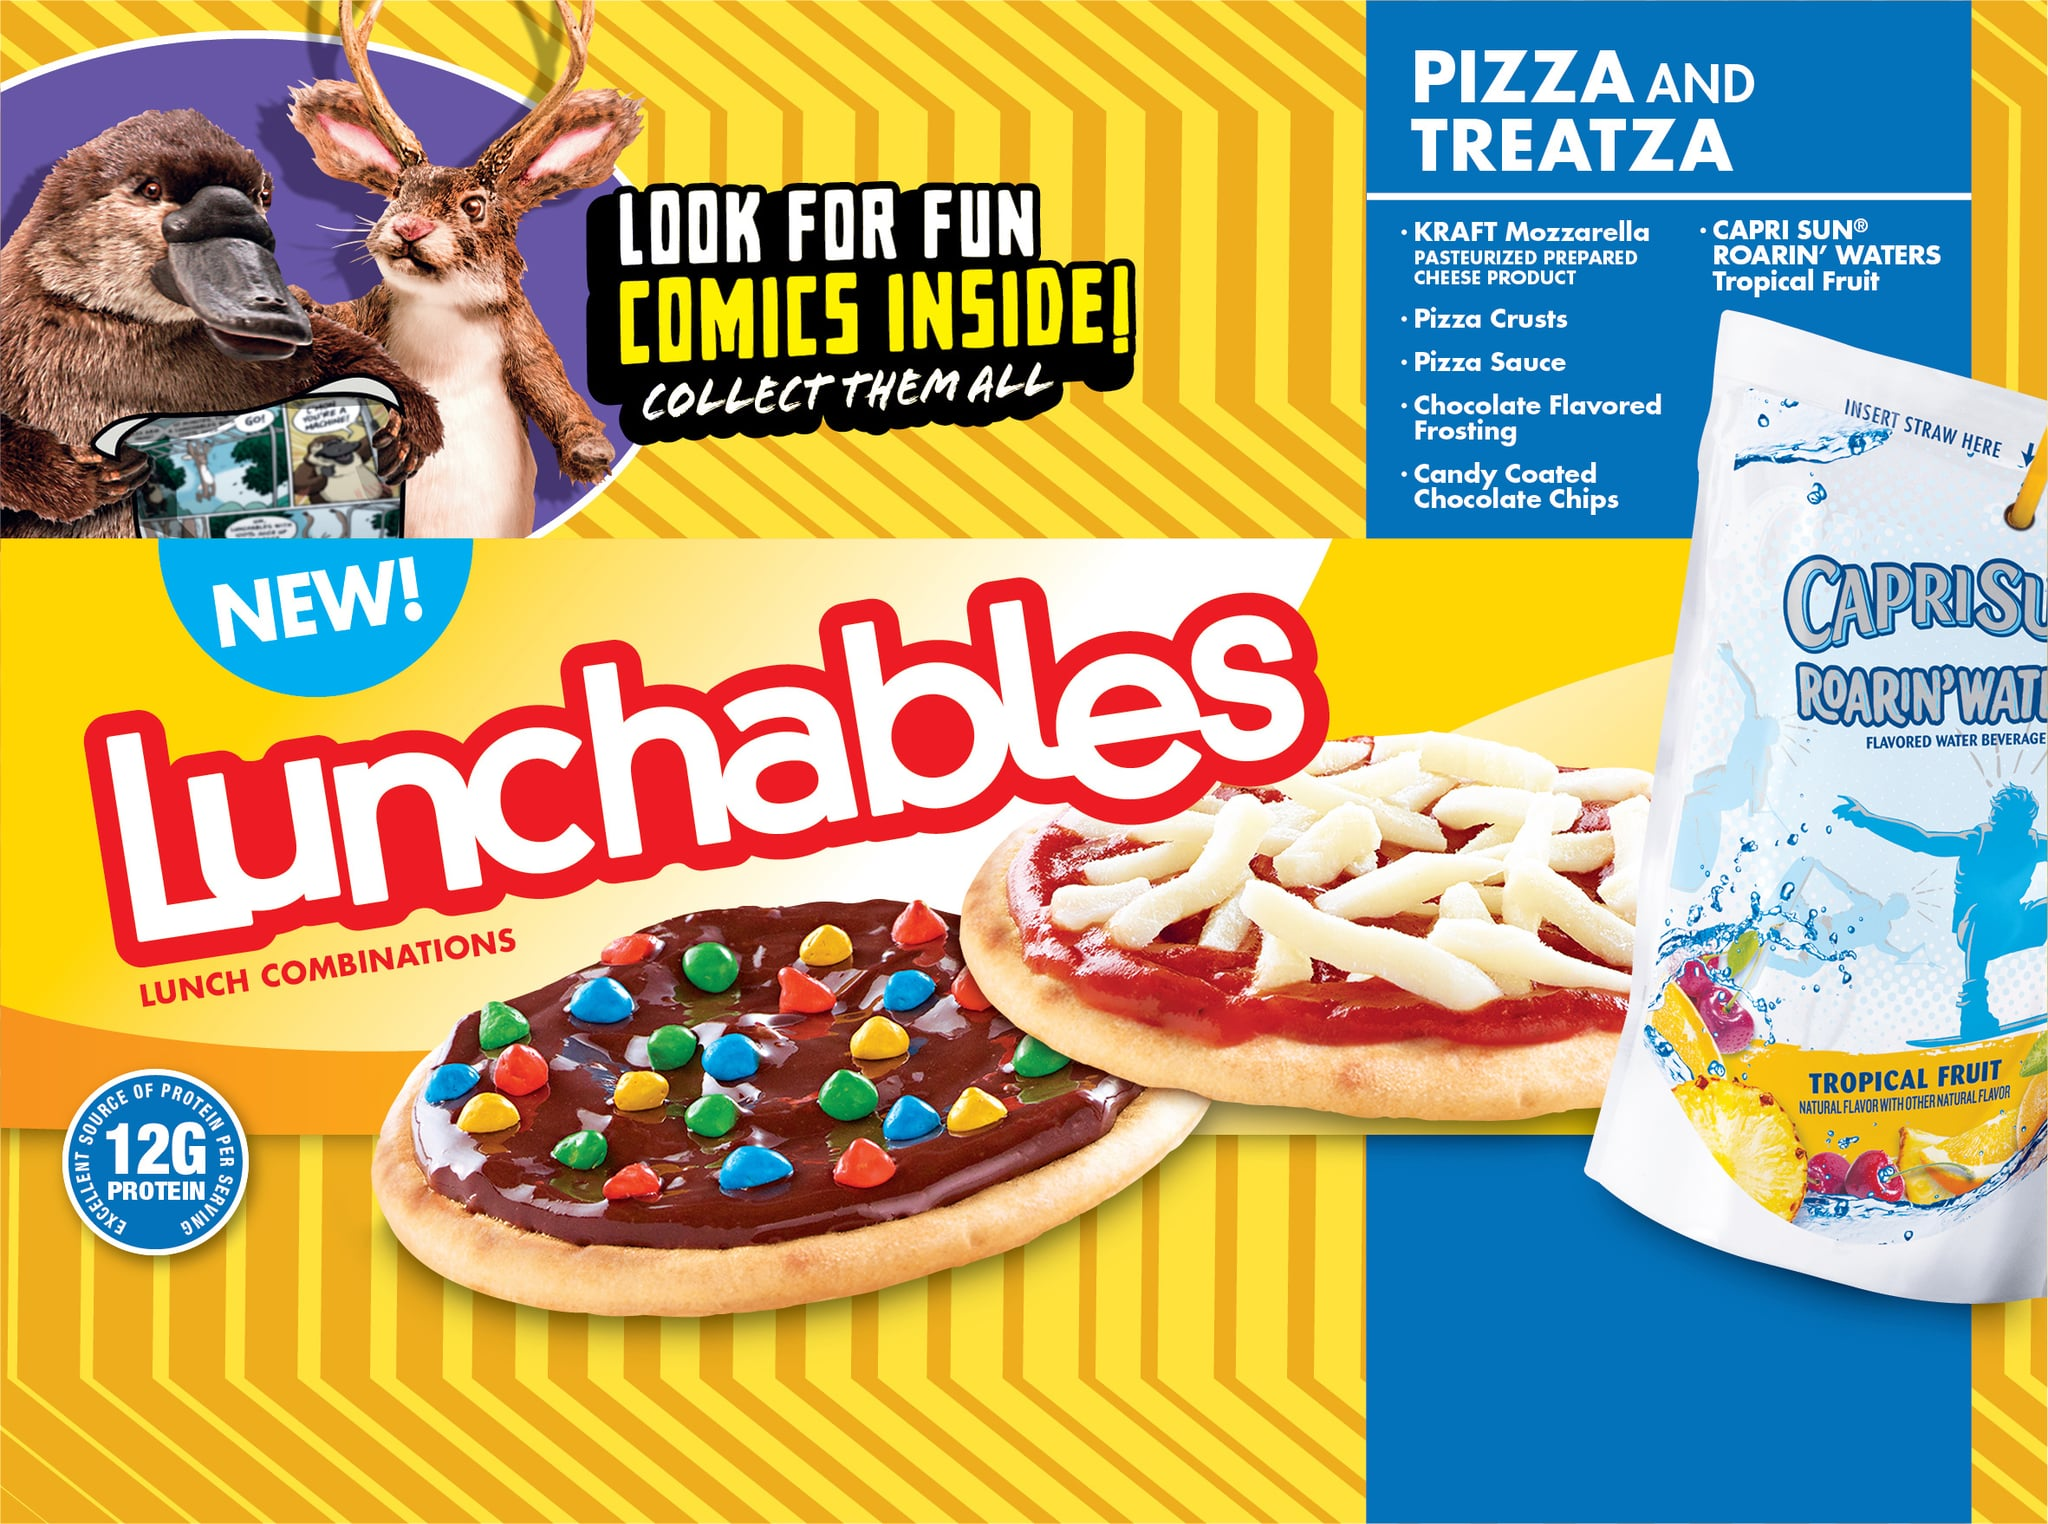 Where Buy Lunchables Pizza Treatza 43921313 besides 34845736 in addition Htm Doll Food further Capri Sun Lemonade v46o uGMWVWdAQM2f0DHyBtD 1lbxSJKG6GbzEQlm A as well Diy Lunchables For Kids. on lunchables with juice